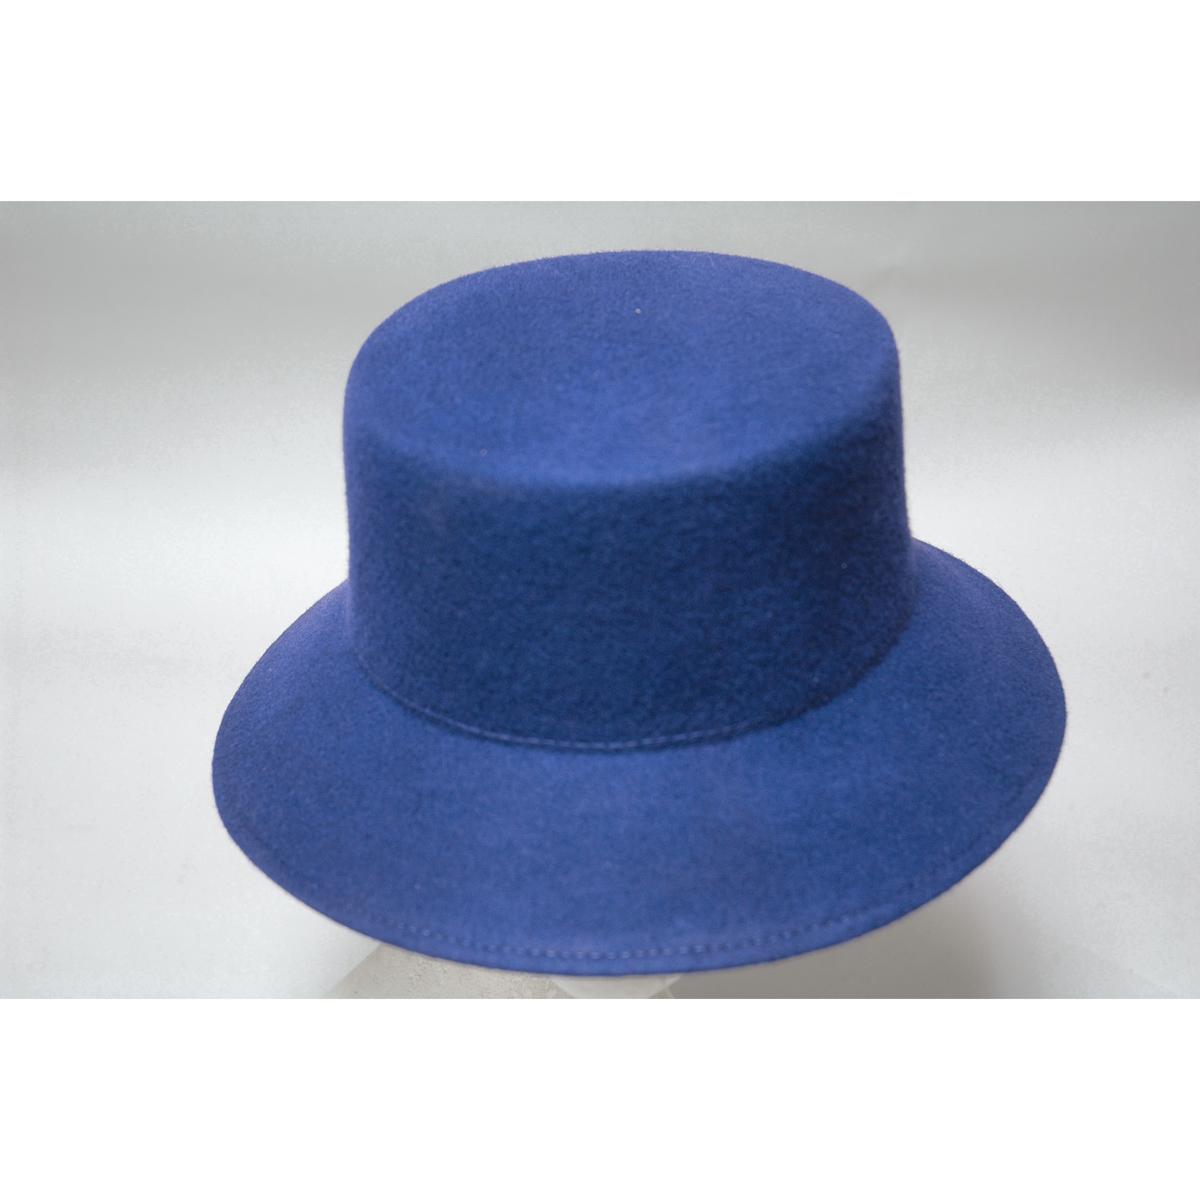 f2a70afe01fe2 Royal Lampshade Small Brim Flat Top Blocked Untrimmed Felt Hat Base